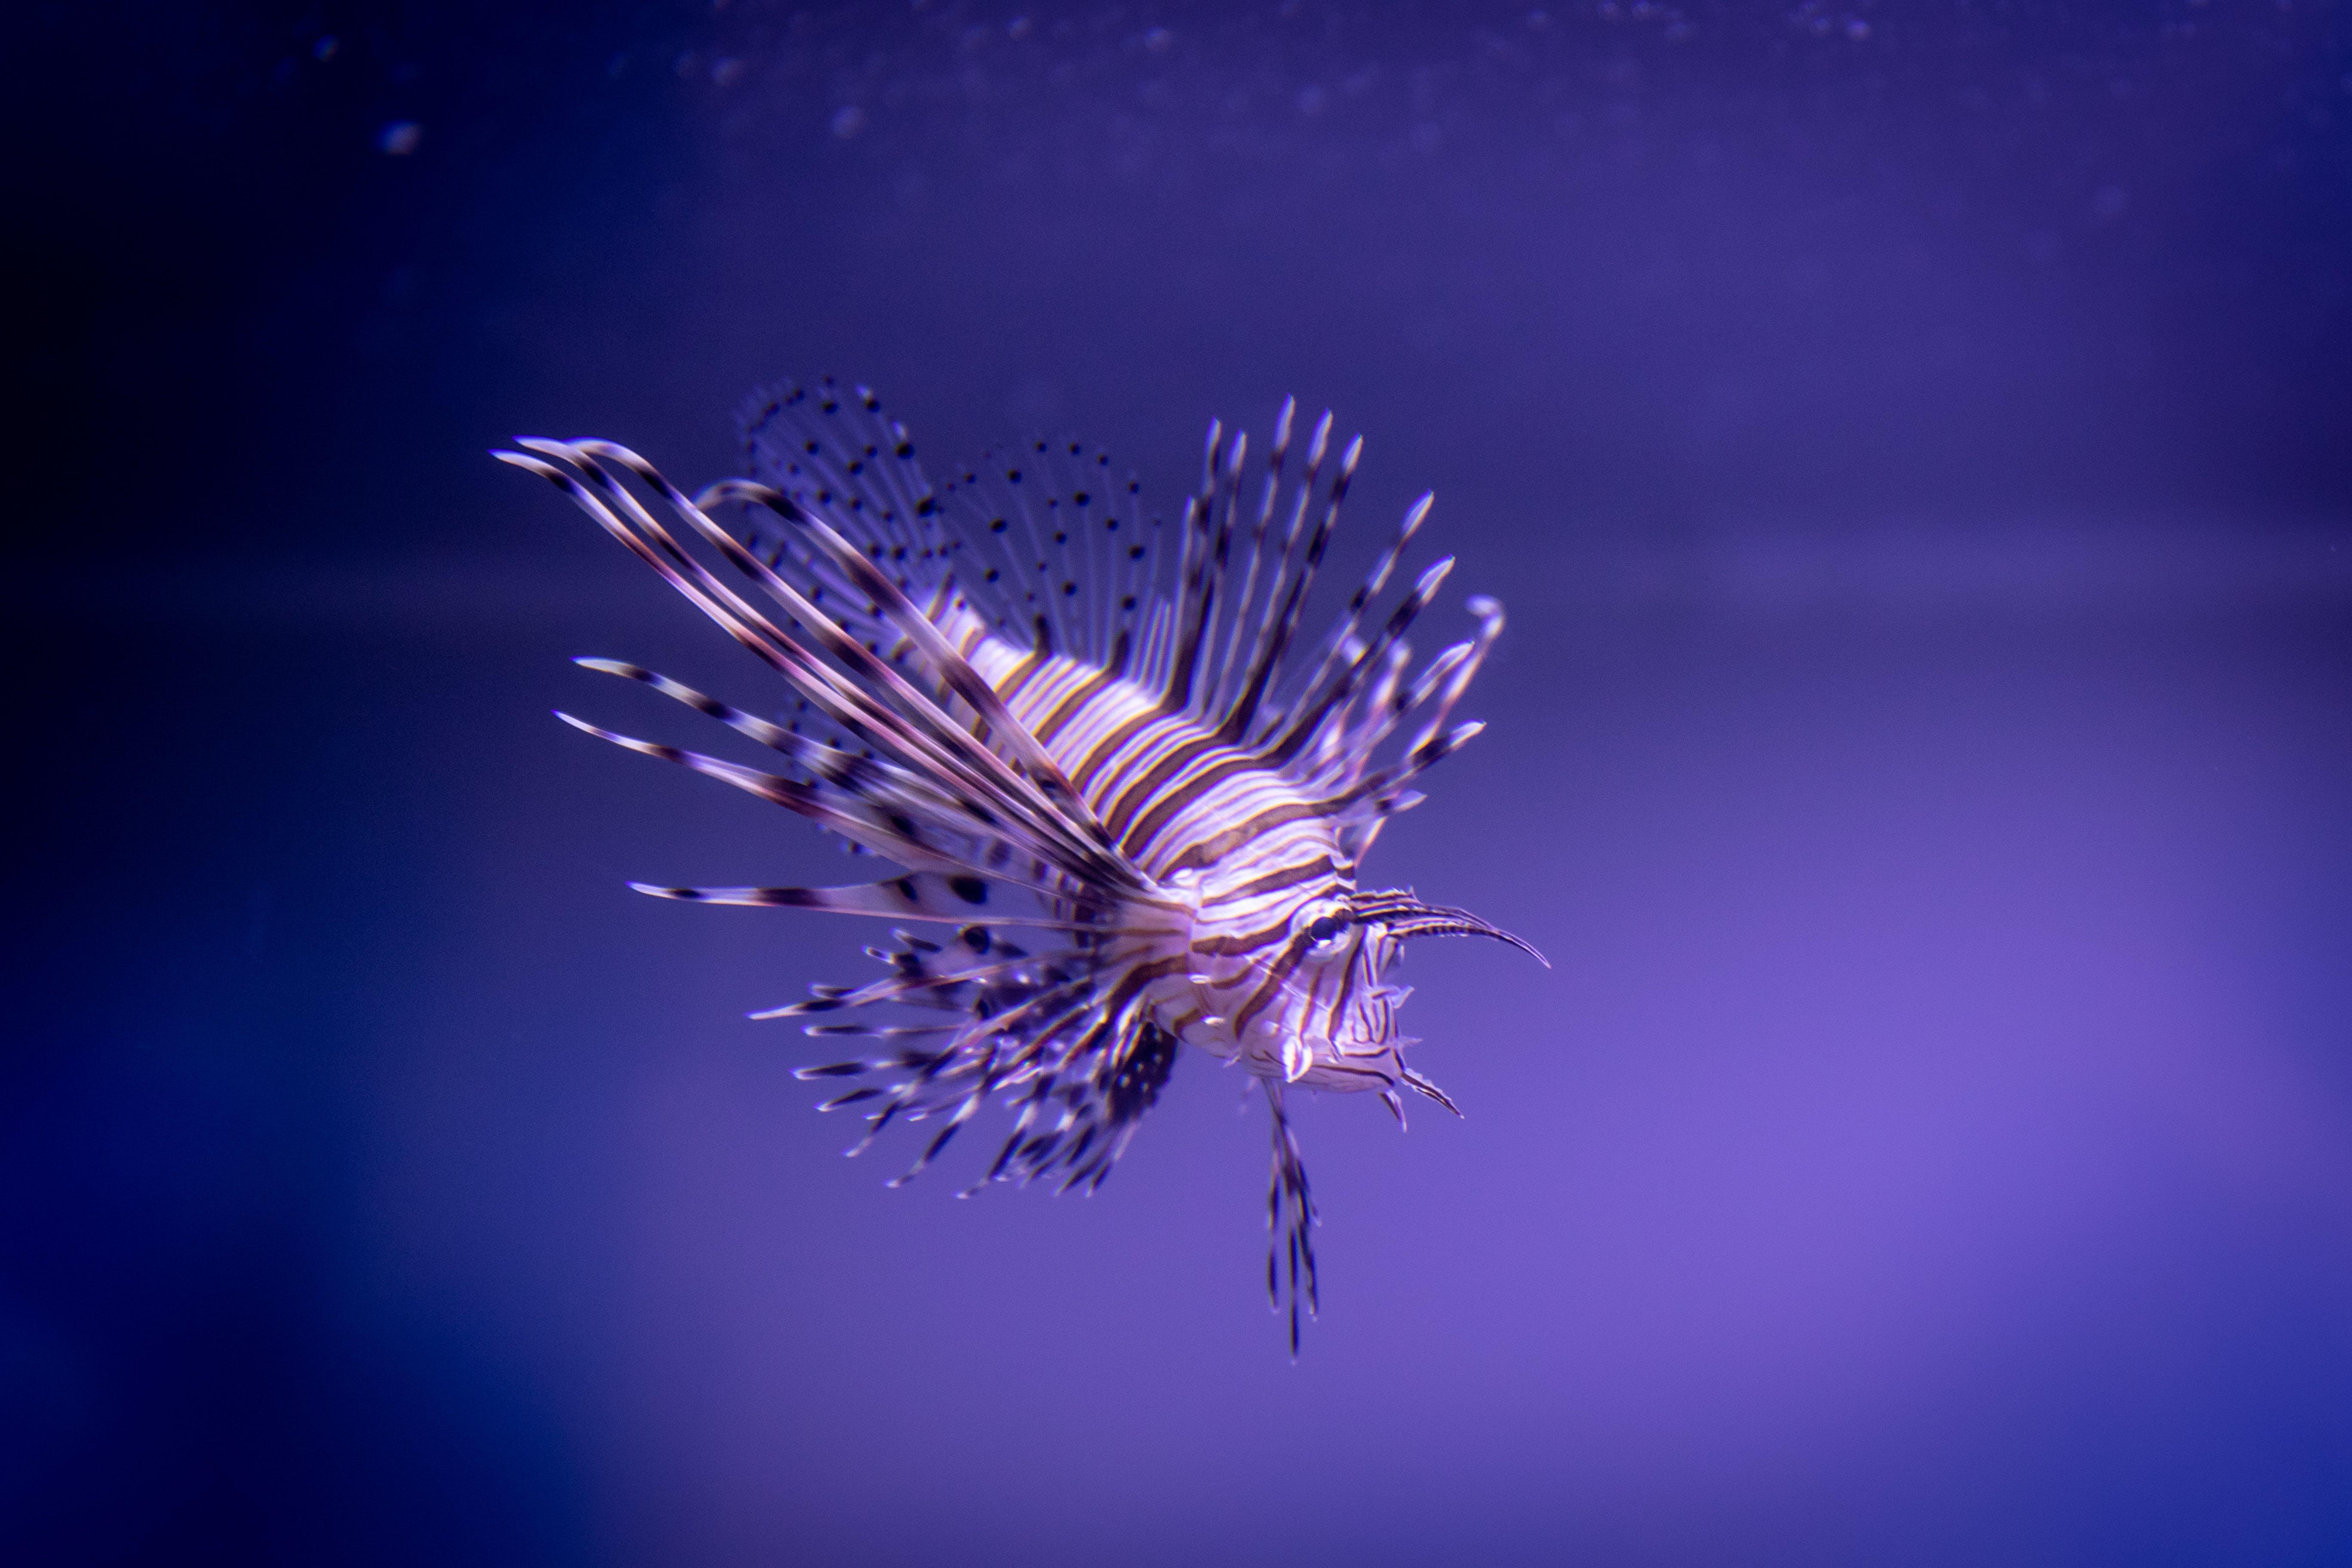 Free stock photo of animal, aquatic animal, biology, blue